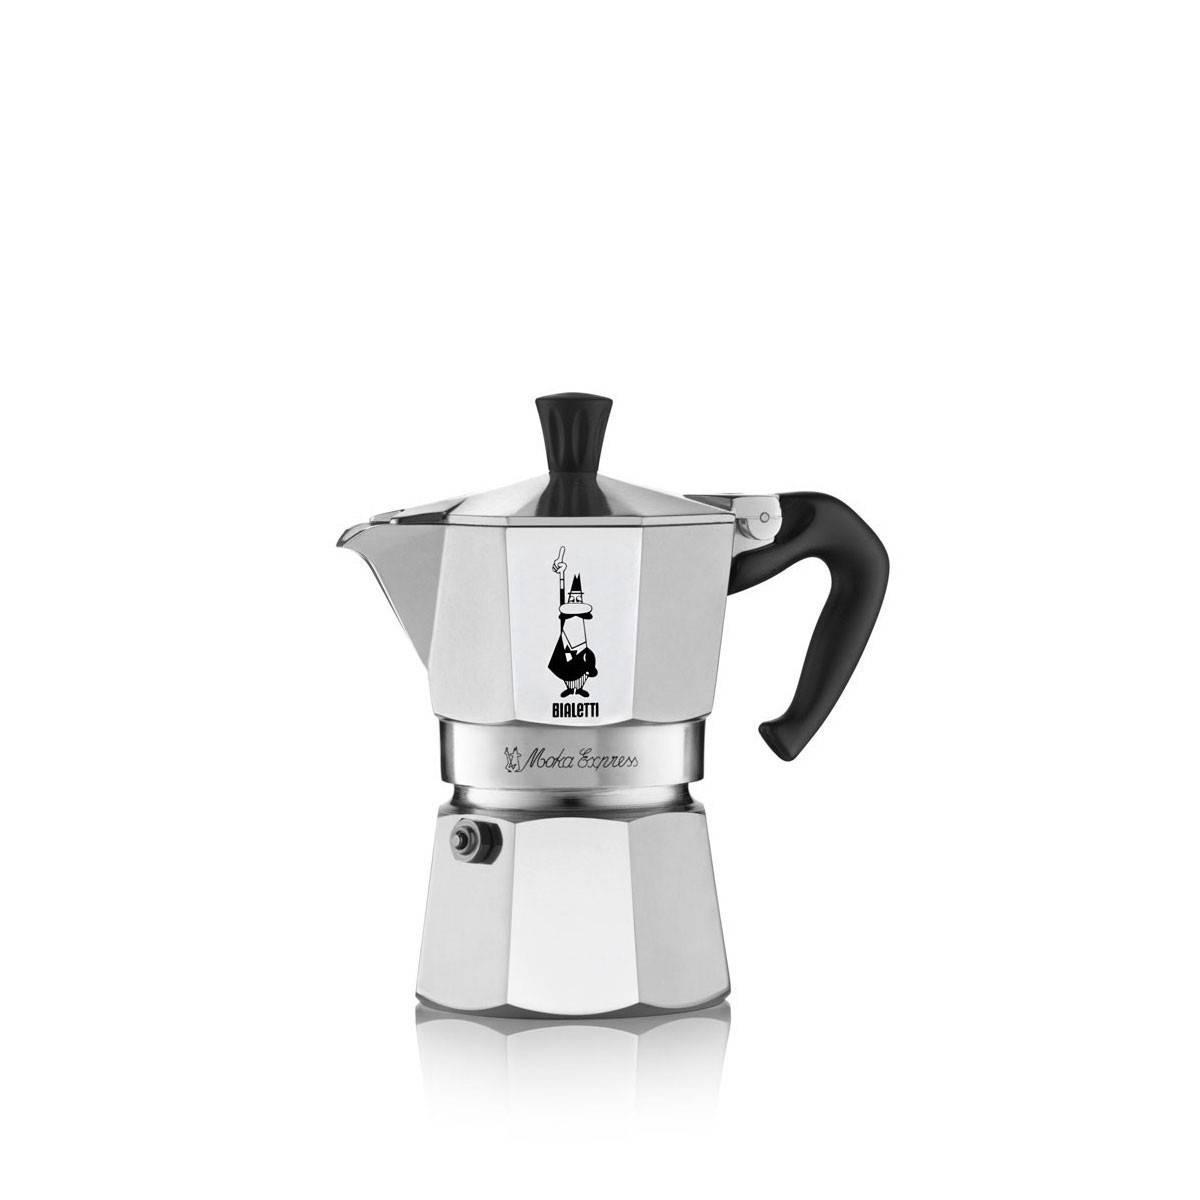 Bialetti kávovar Moka Express na 3 šálky - Bialetti